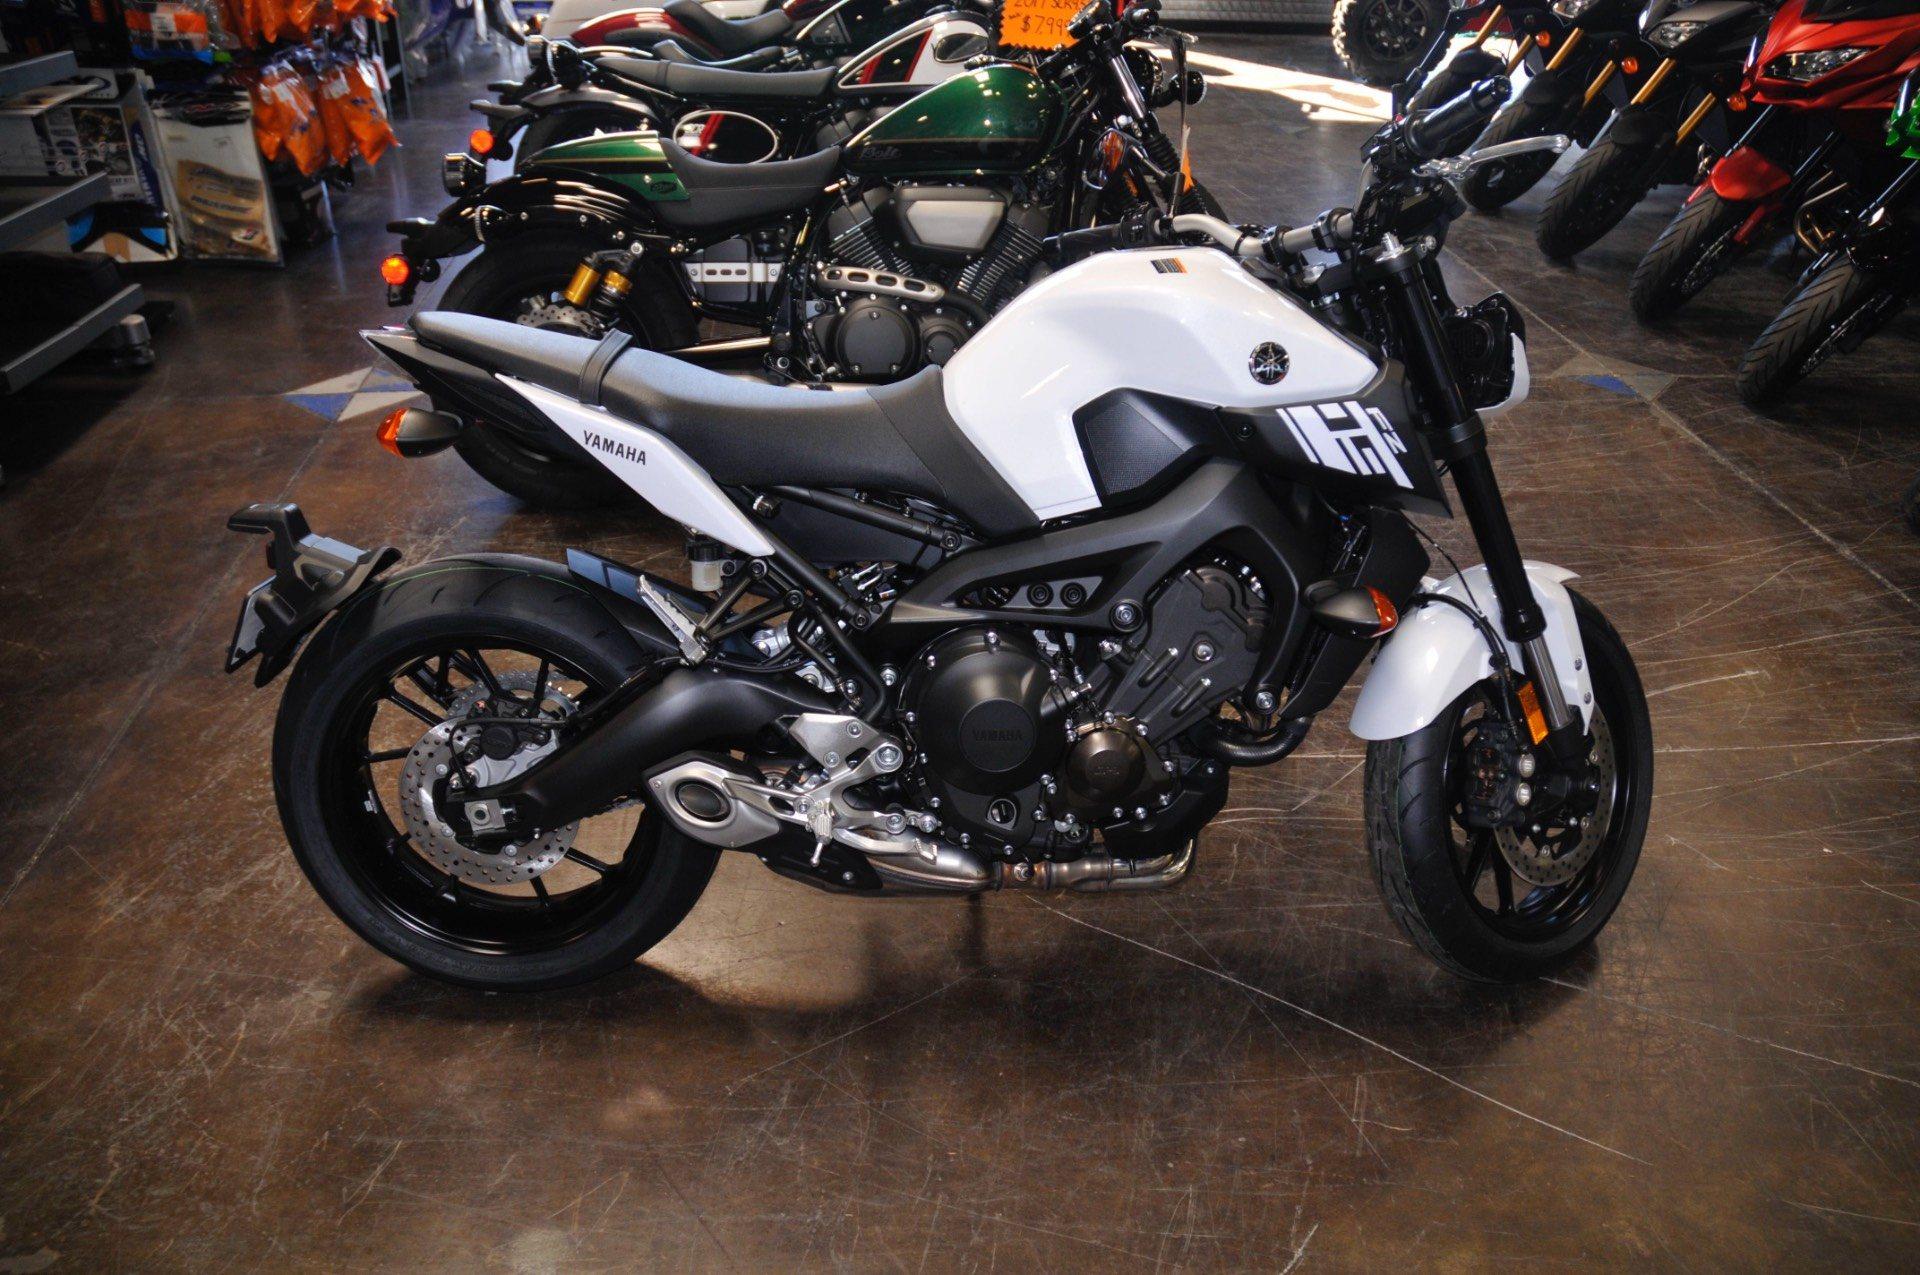 2017 Yamaha FZ-09 in Roseville, California